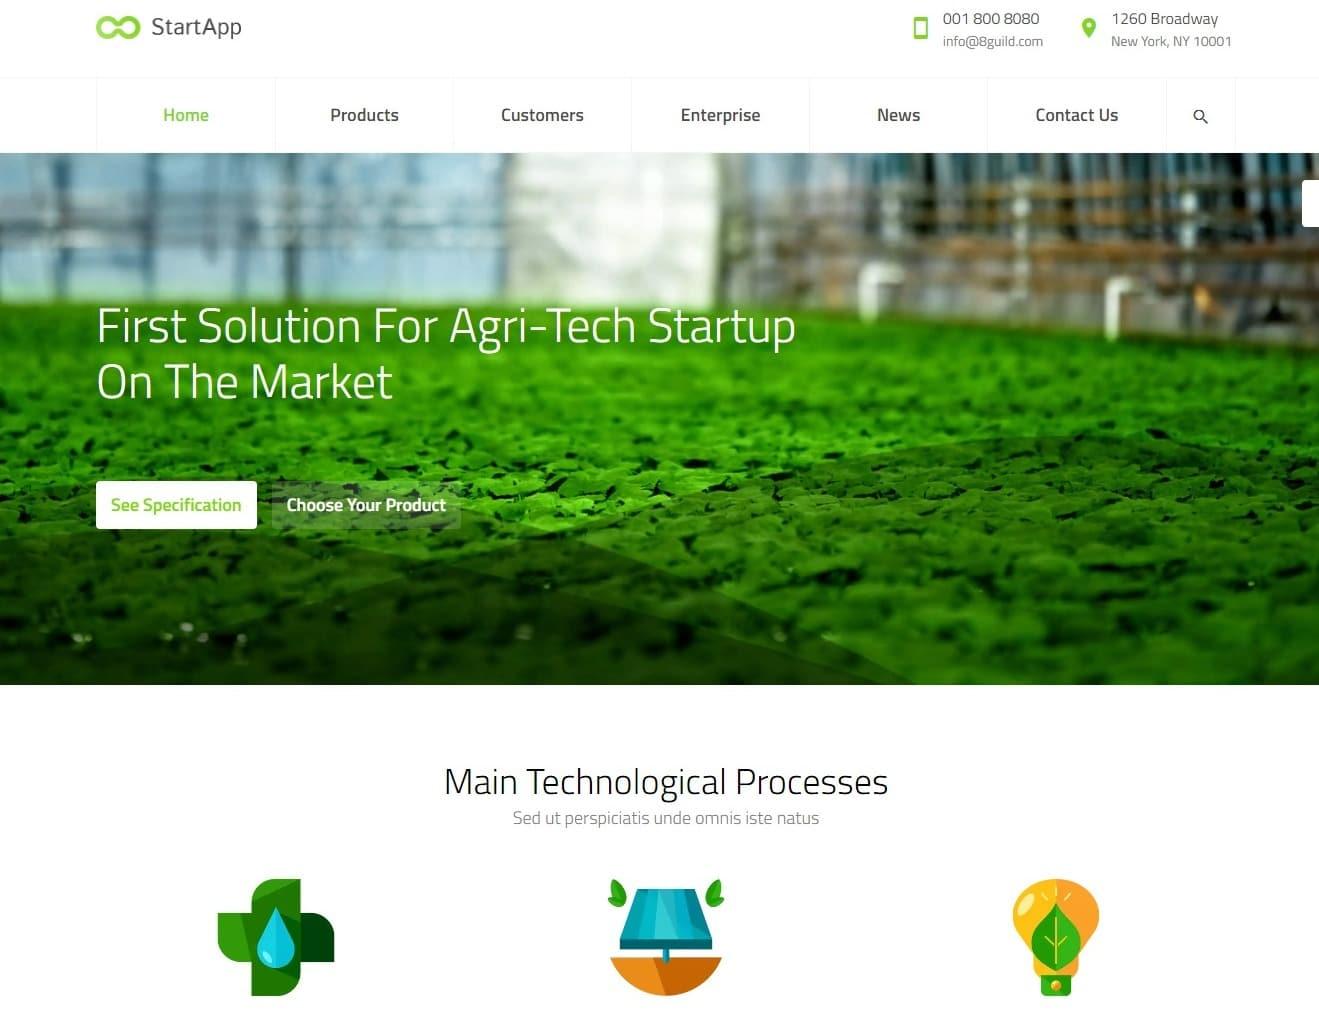 startapp-agriculture-website-template